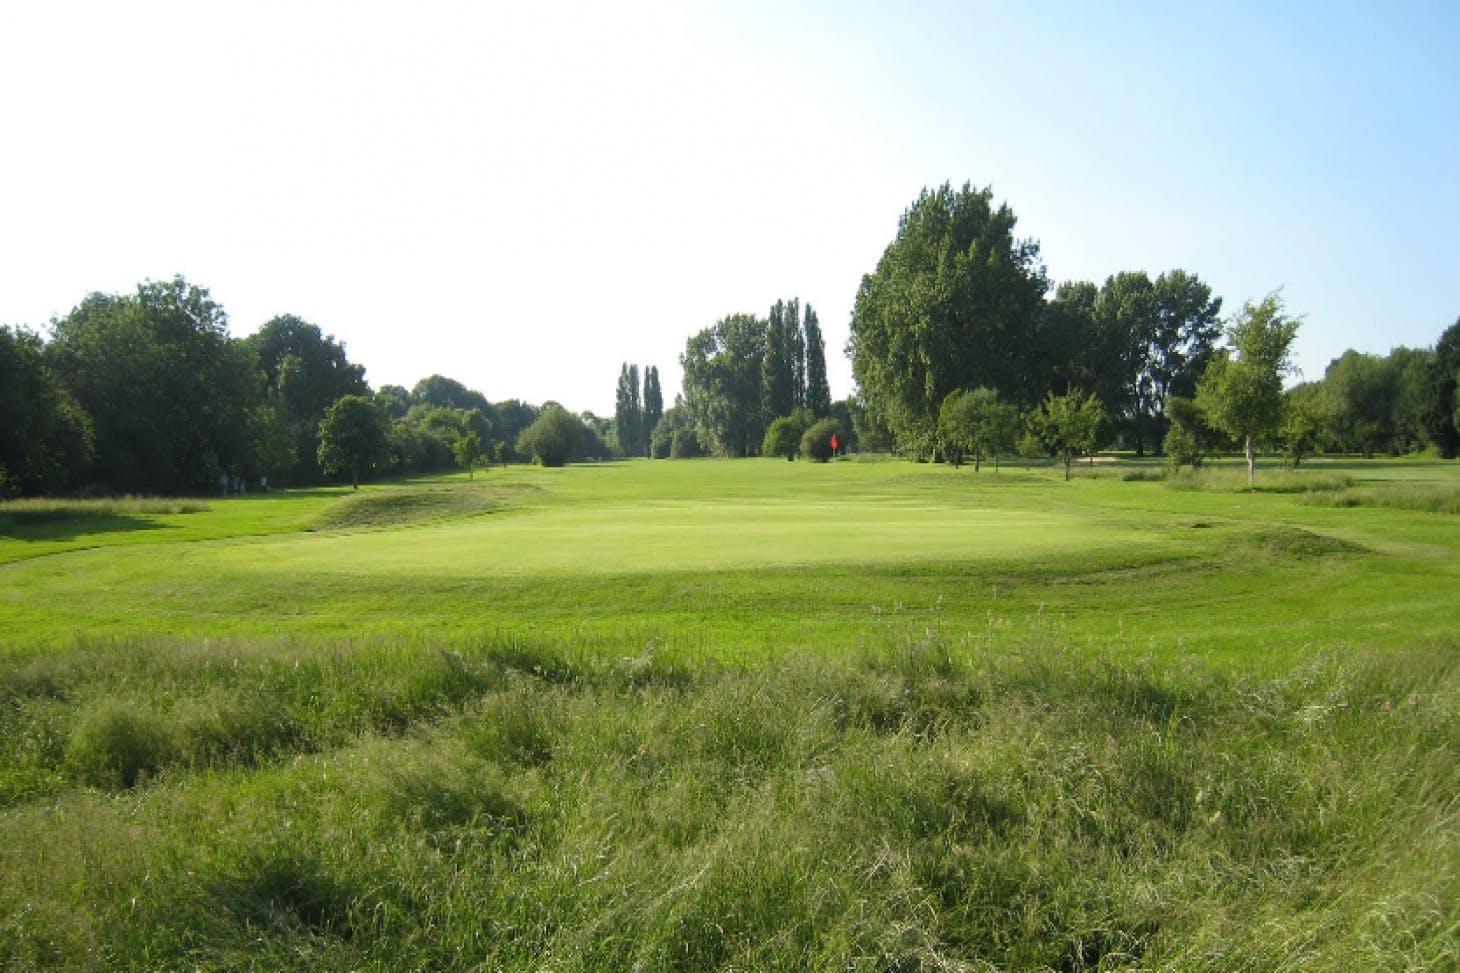 Datchet Golf Club 9 hole golf course